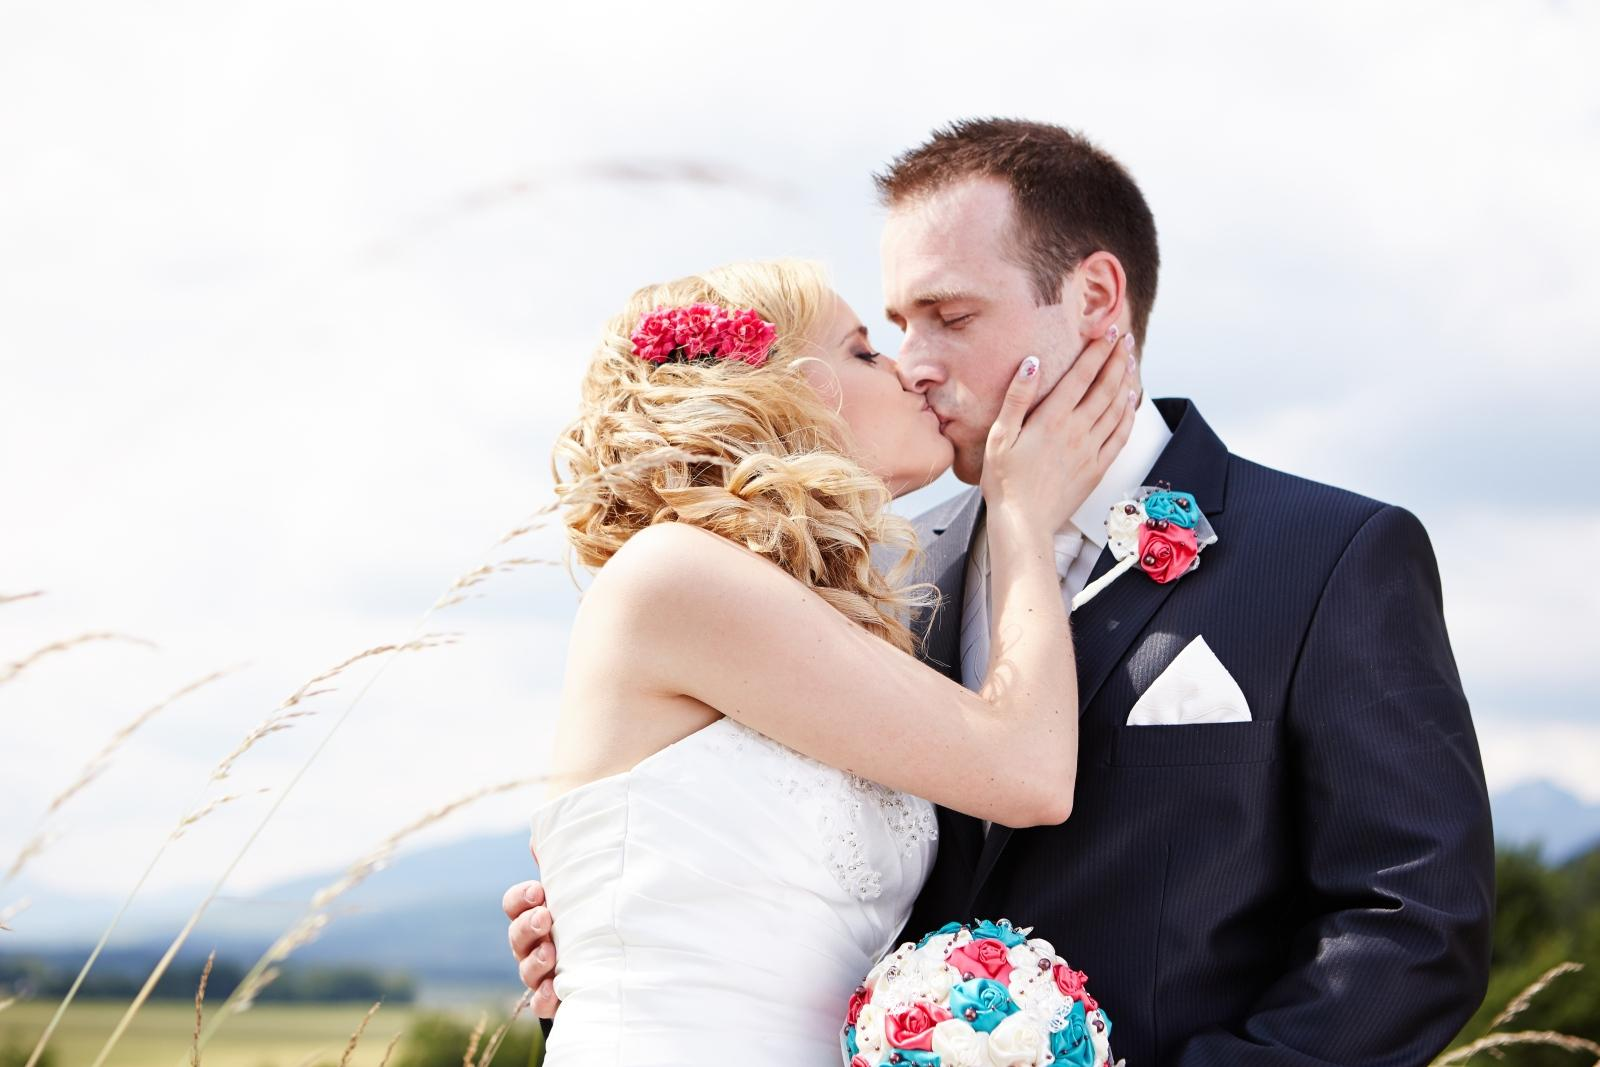 Svadba J+T - Obrázok č. 15